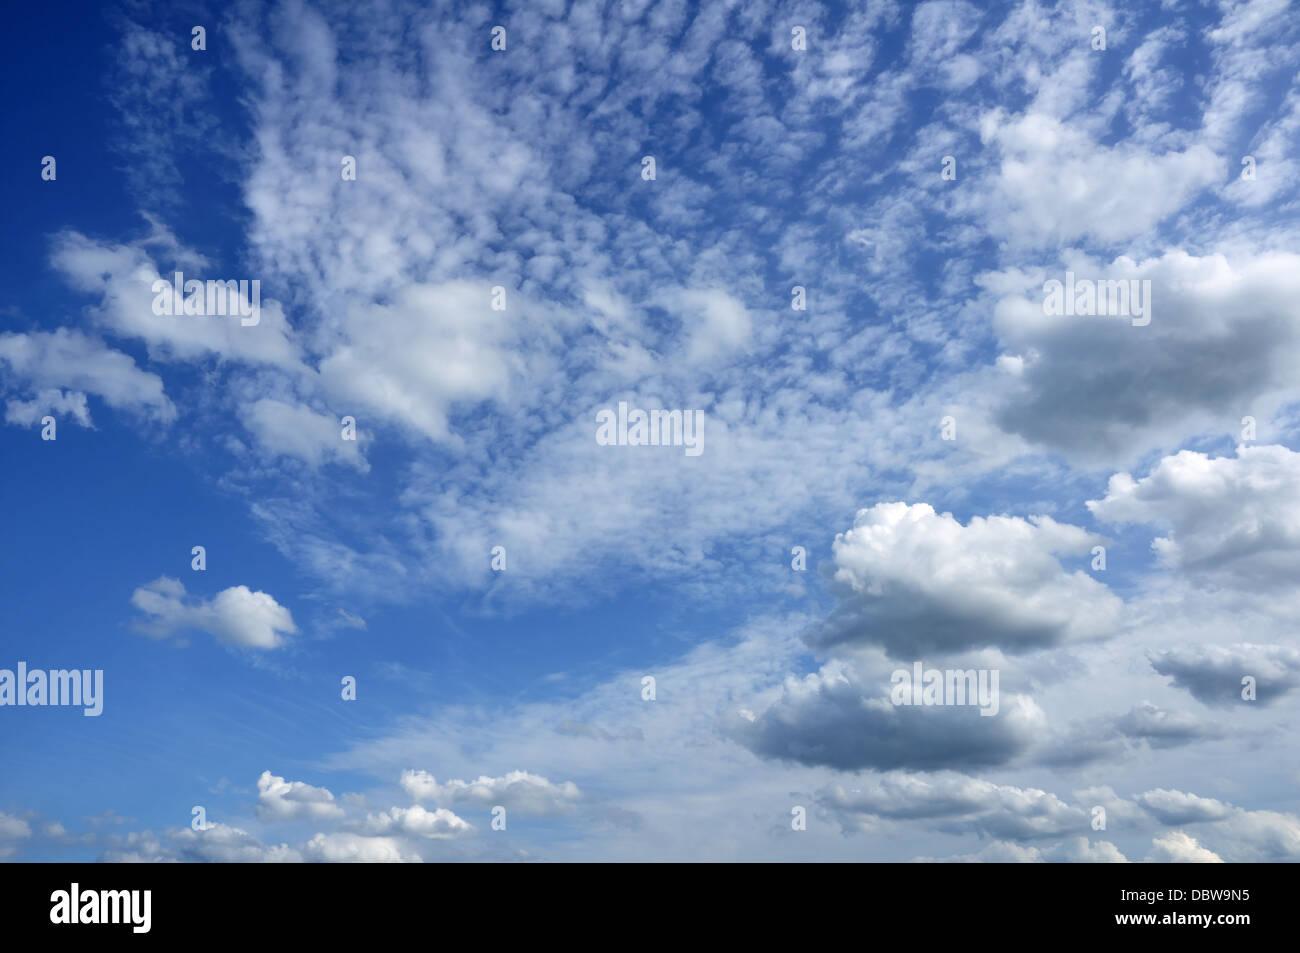 Cumulus and Altocumulus Clouds in a Blue Sky - Stock Image